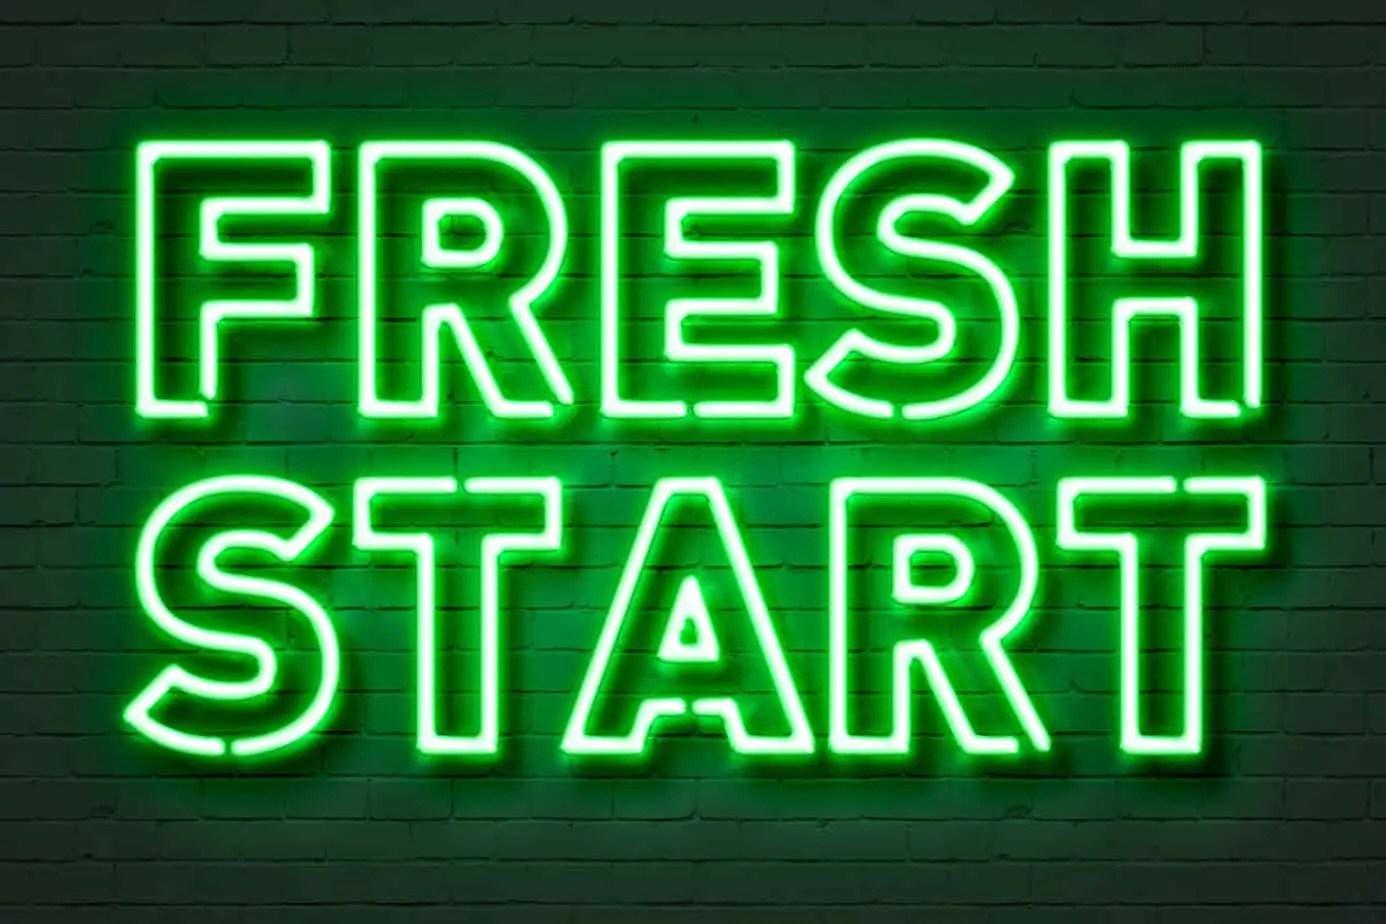 Fresh start neon sign on brick wall background